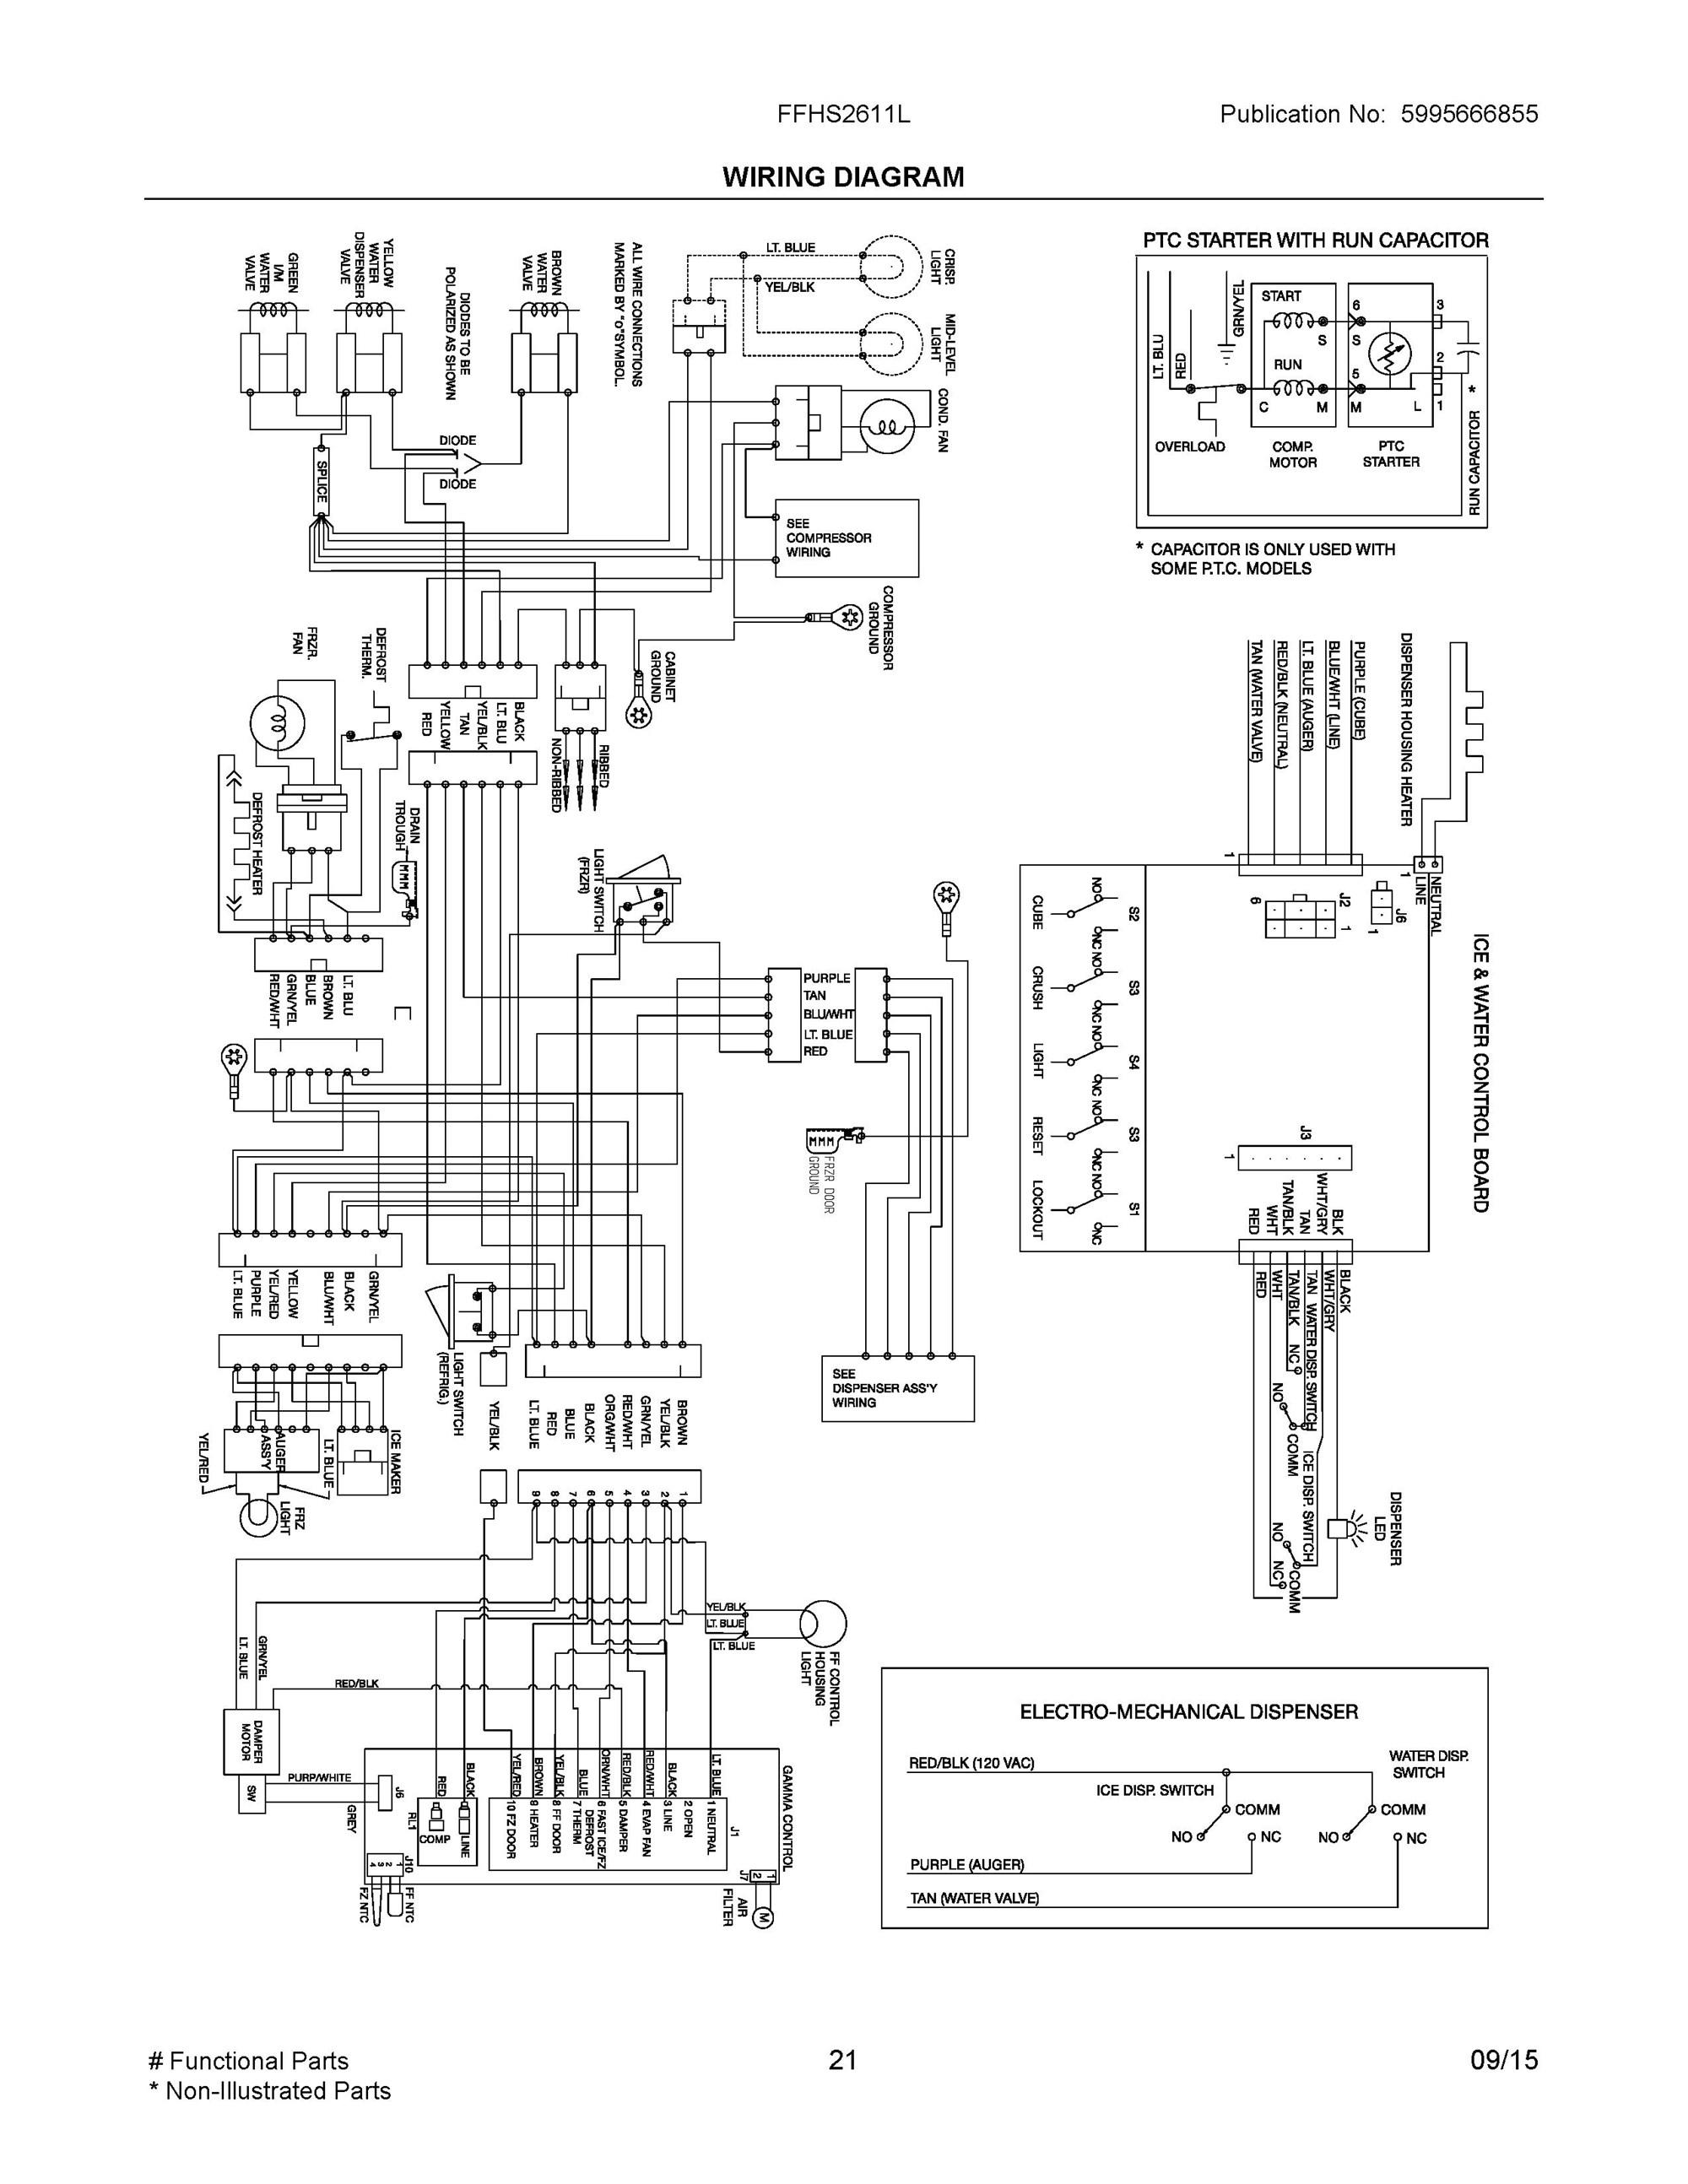 wolf microwave wiring diagram frigidaire microwave wiring diagram ffhs2611lwma wiring diagram frigidaire company #15